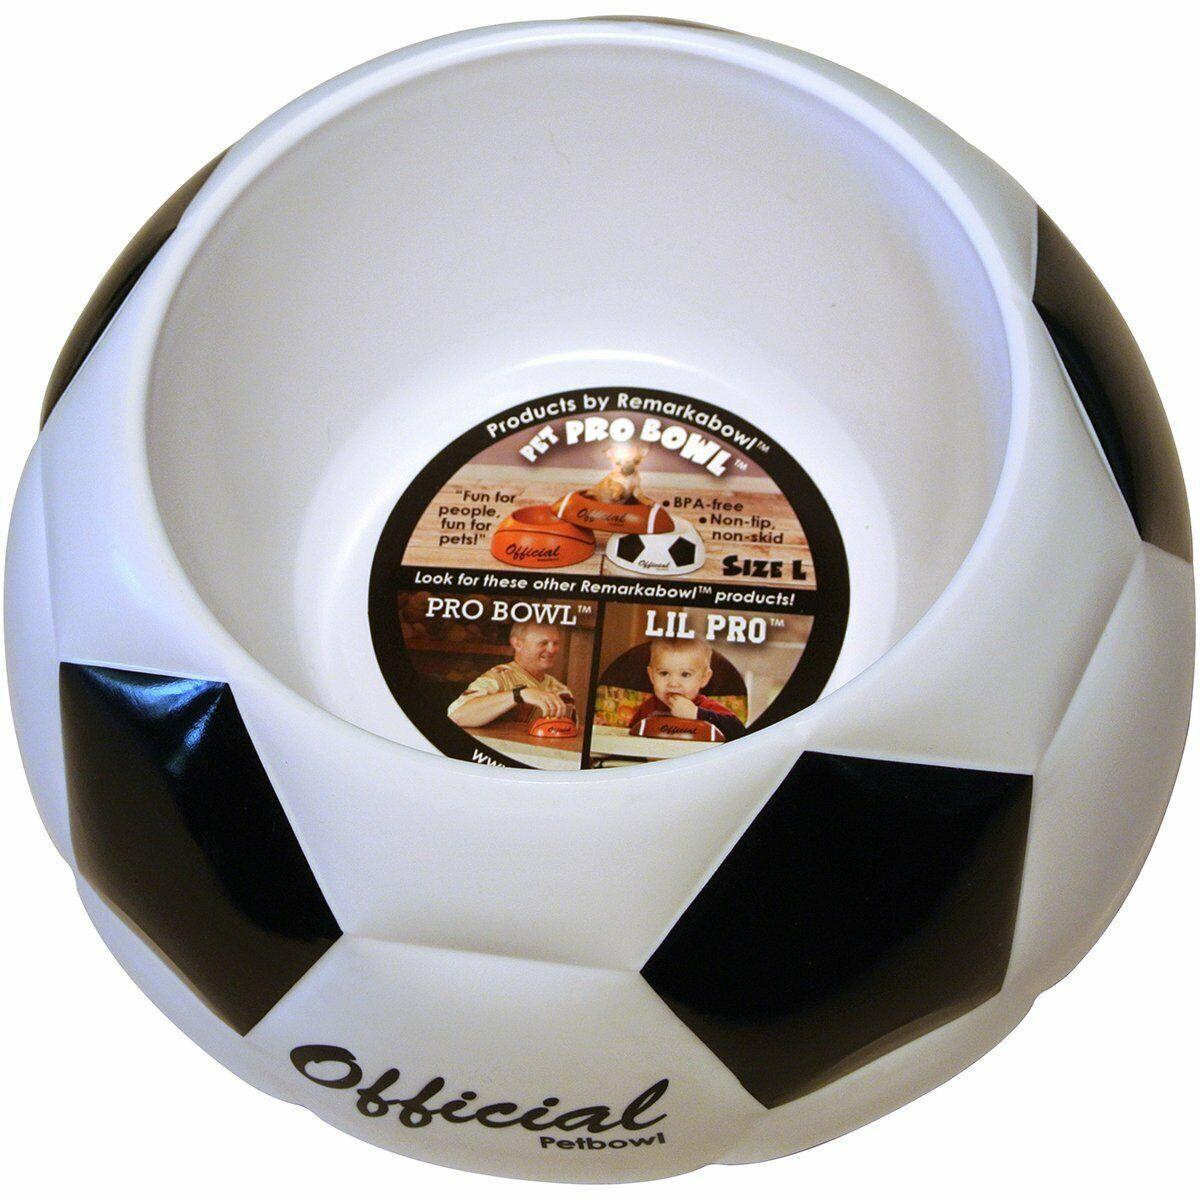 Remarkabowl Pet-Pro Soccerbowl Pet Food Dish Soccer, Small